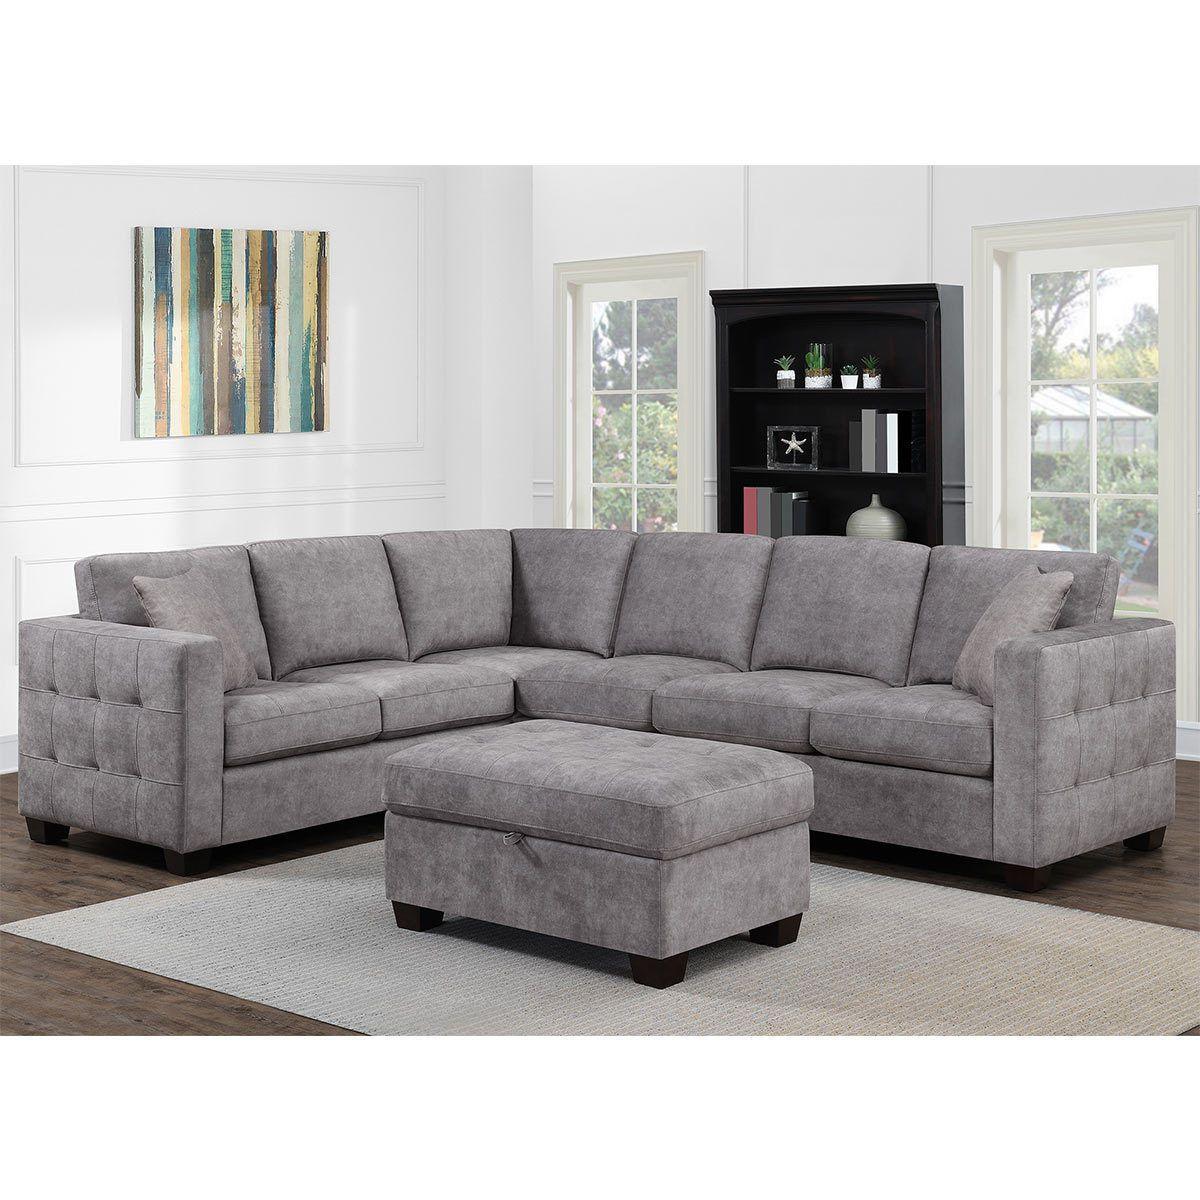 Thomasville Kylie Grey Fabric Corner Sofa With Storage Ottoman Corner Sofa With Storage Grey Fabric Corner Sofa Sofa